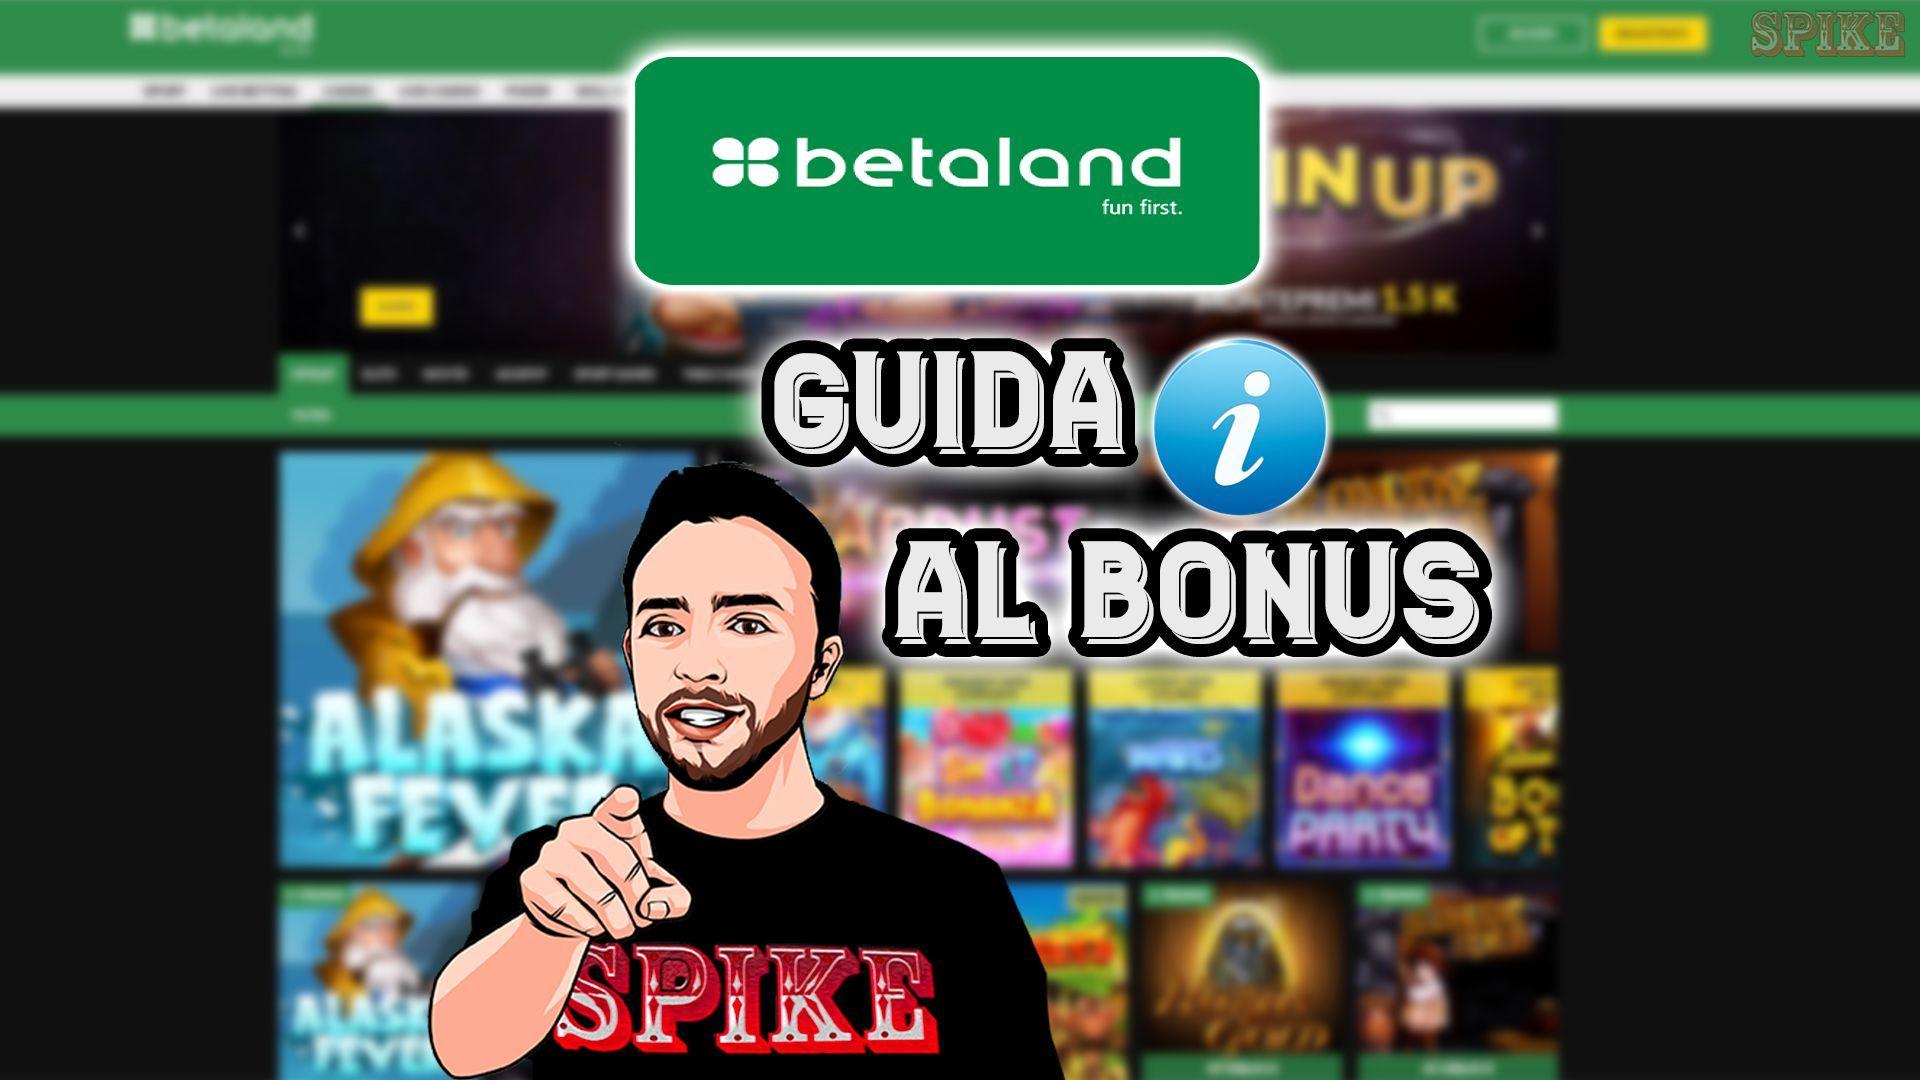 betaland-guida-bonus-spike